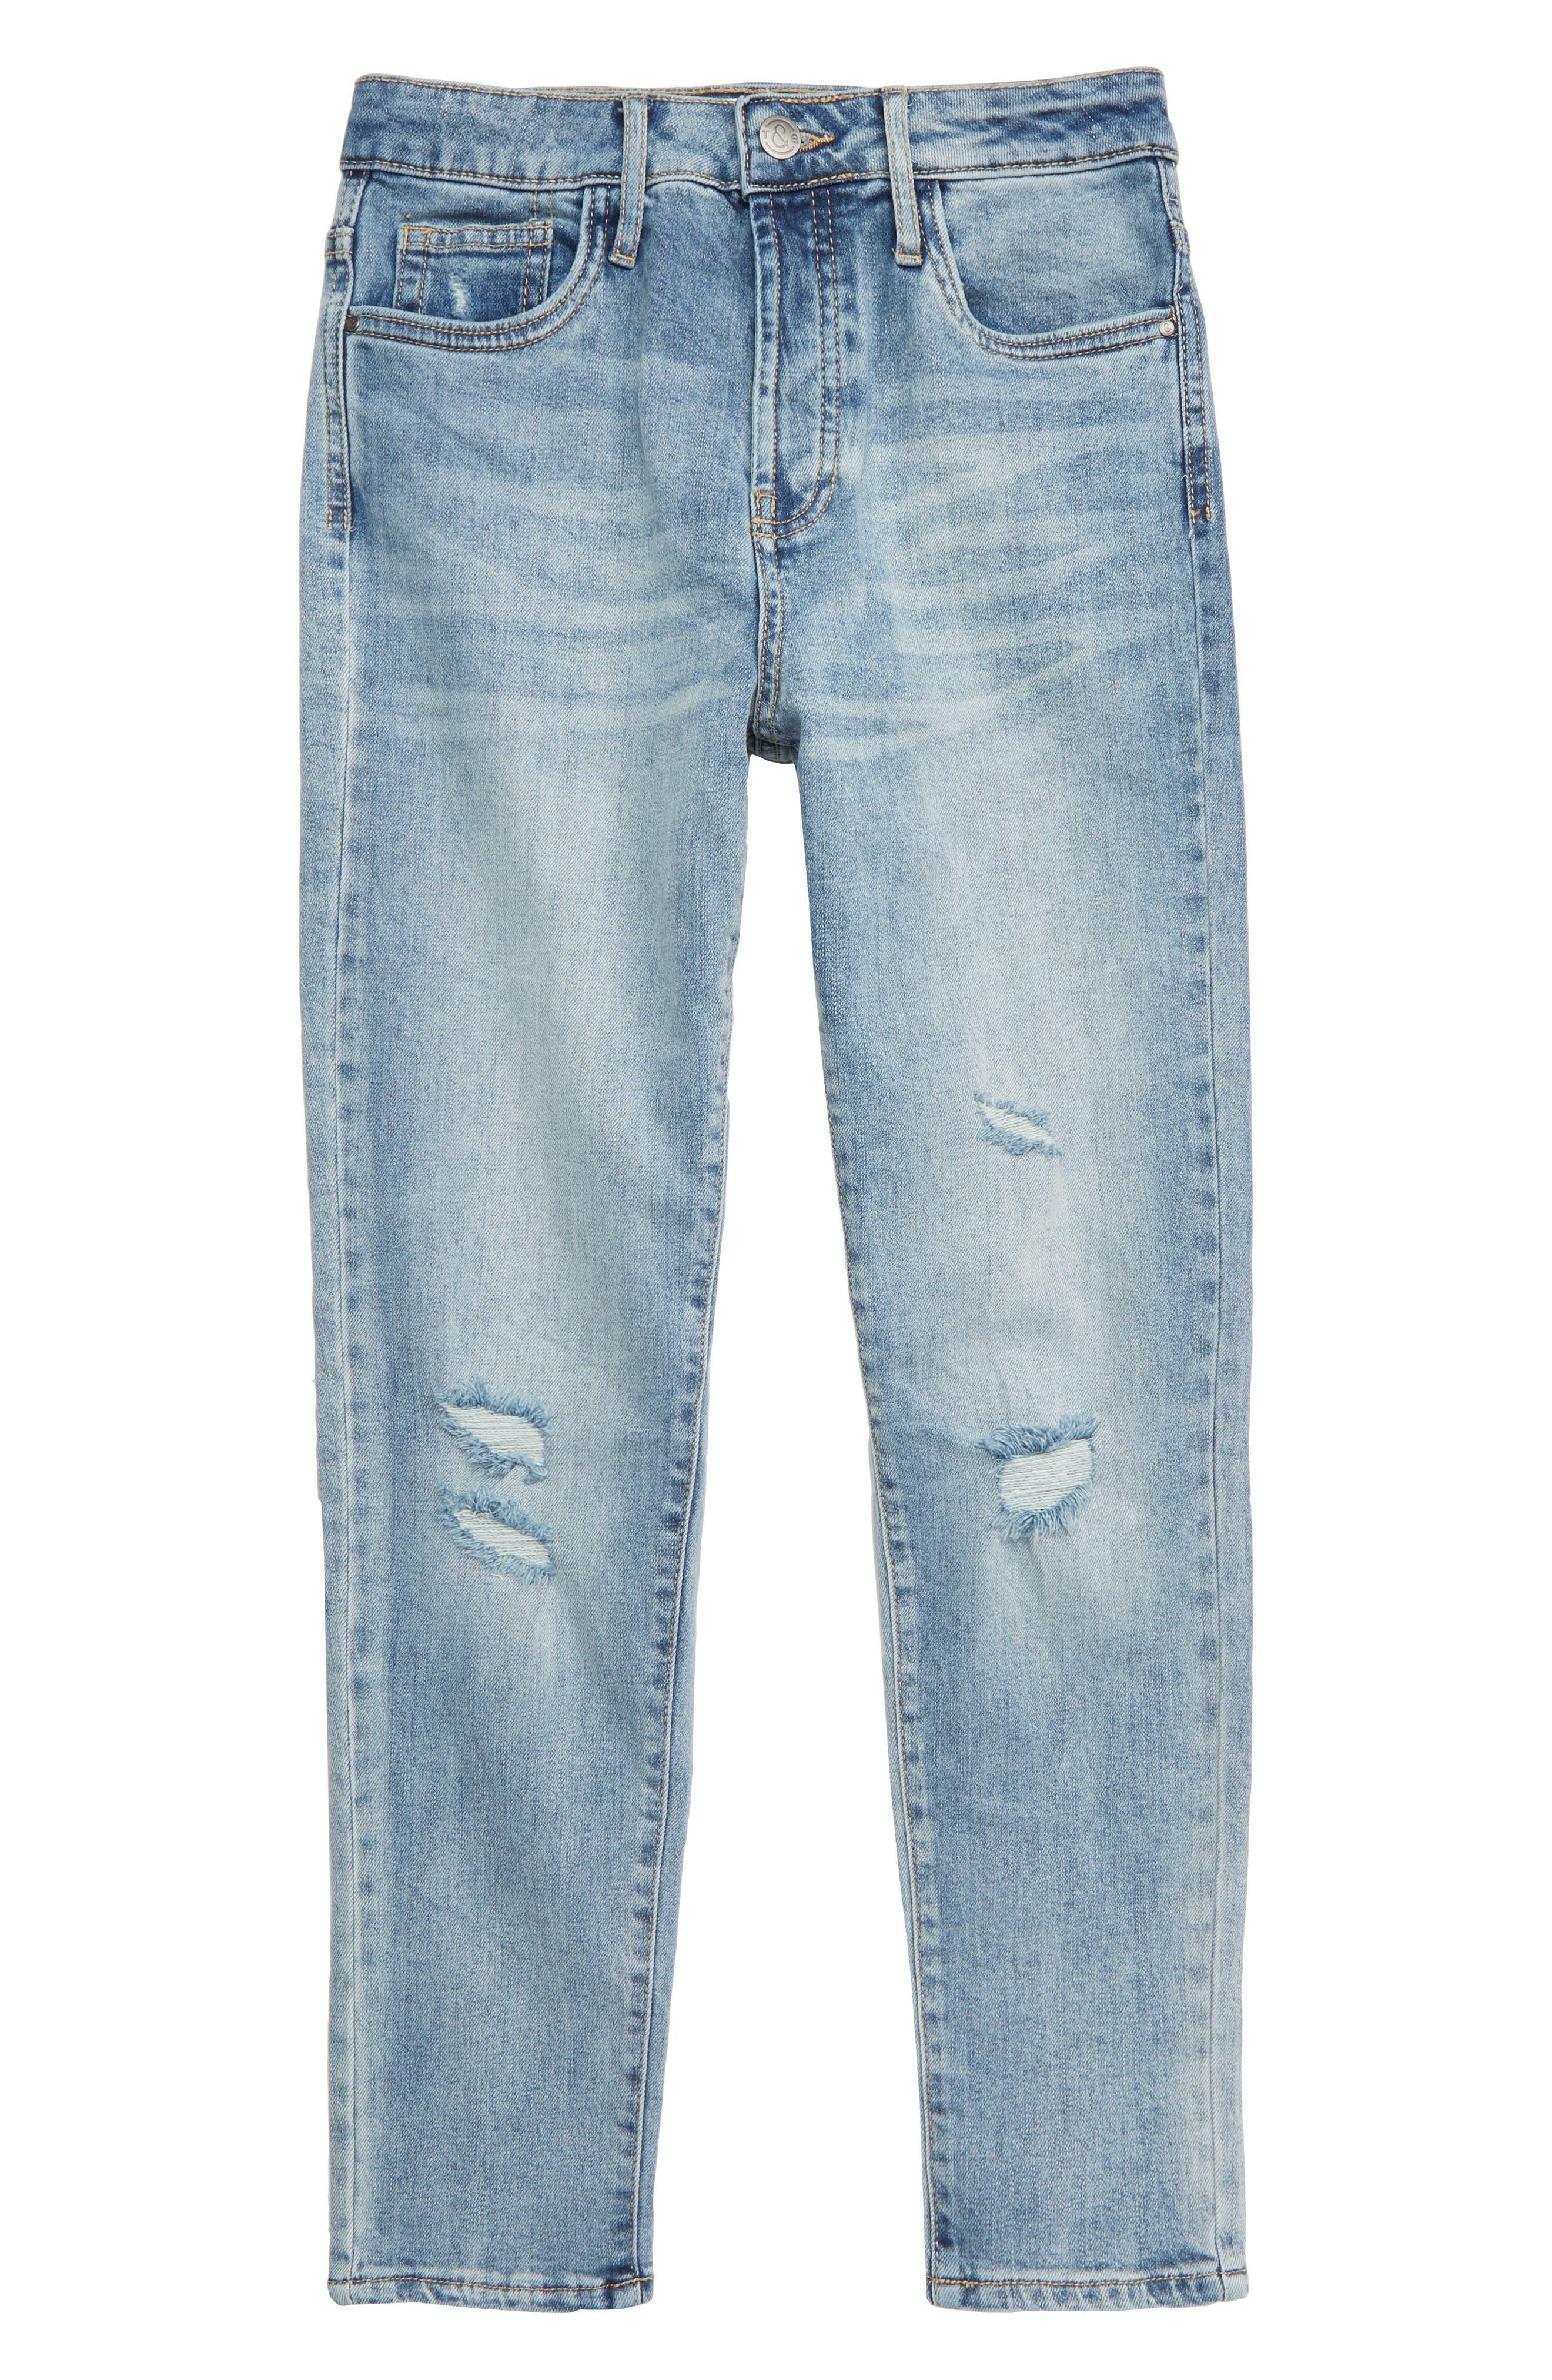 TREASURE & BOND, High Waist Distressed Skinny Jeans, Main thumbnail 1, color, VINTAGE LIGHT WASH